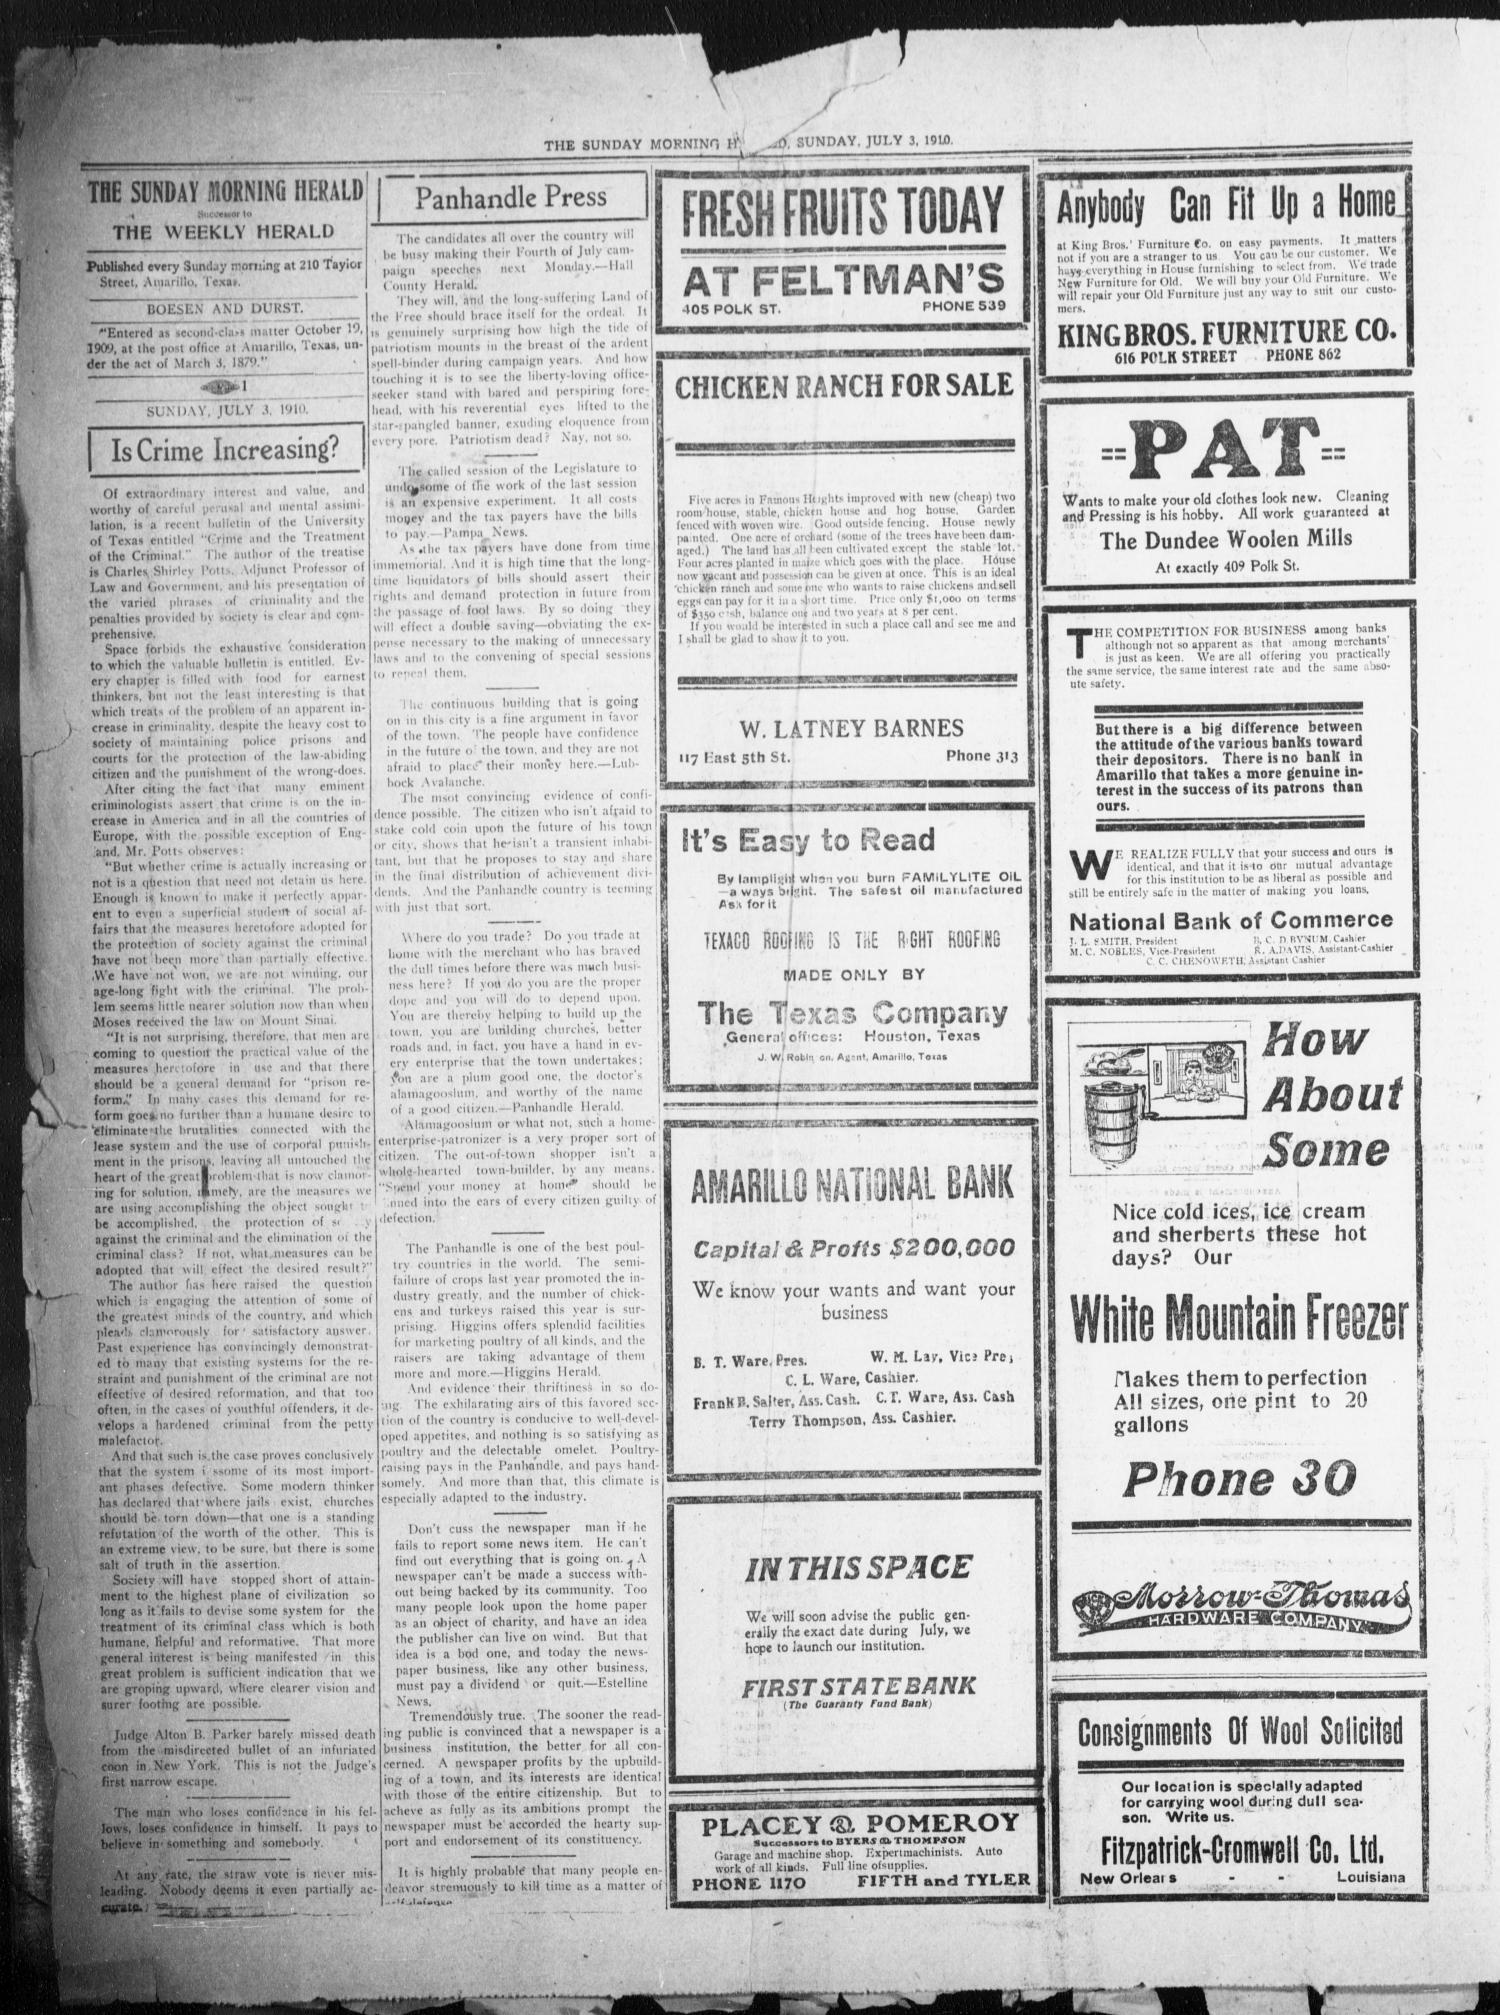 The Sunday Morning Herald  (Amarillo, Tex ), Vol  22, No  23